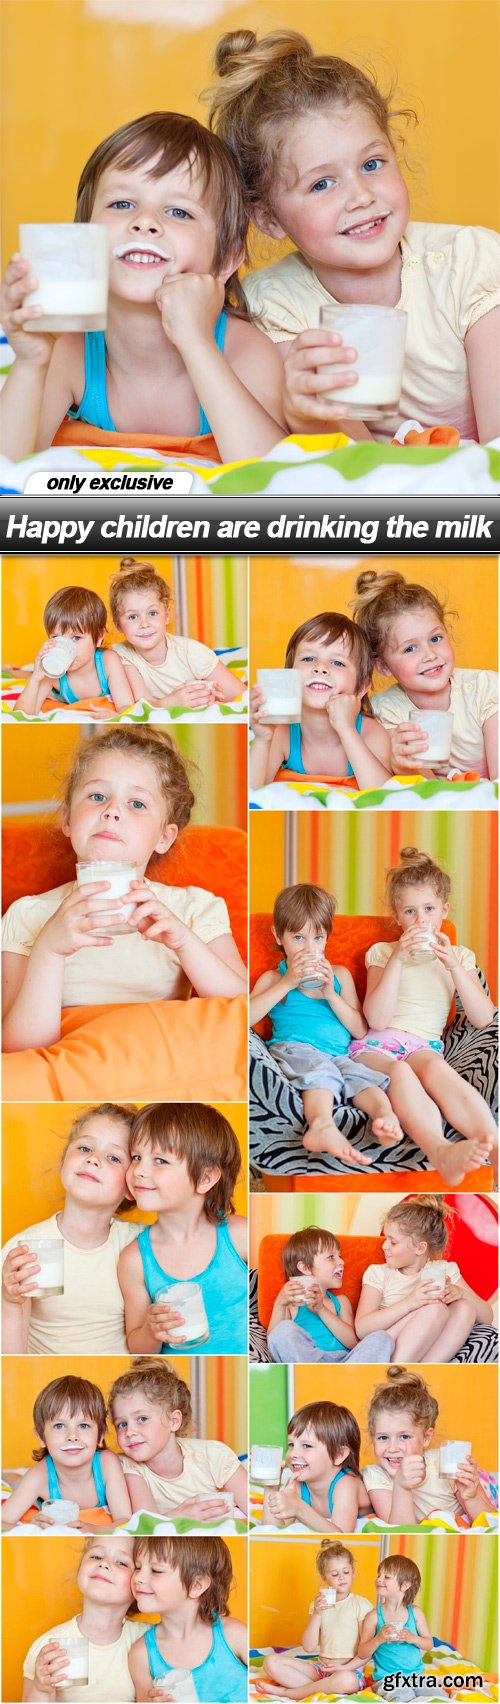 Happy children are drinking the milk - 10 UHQ JPEG